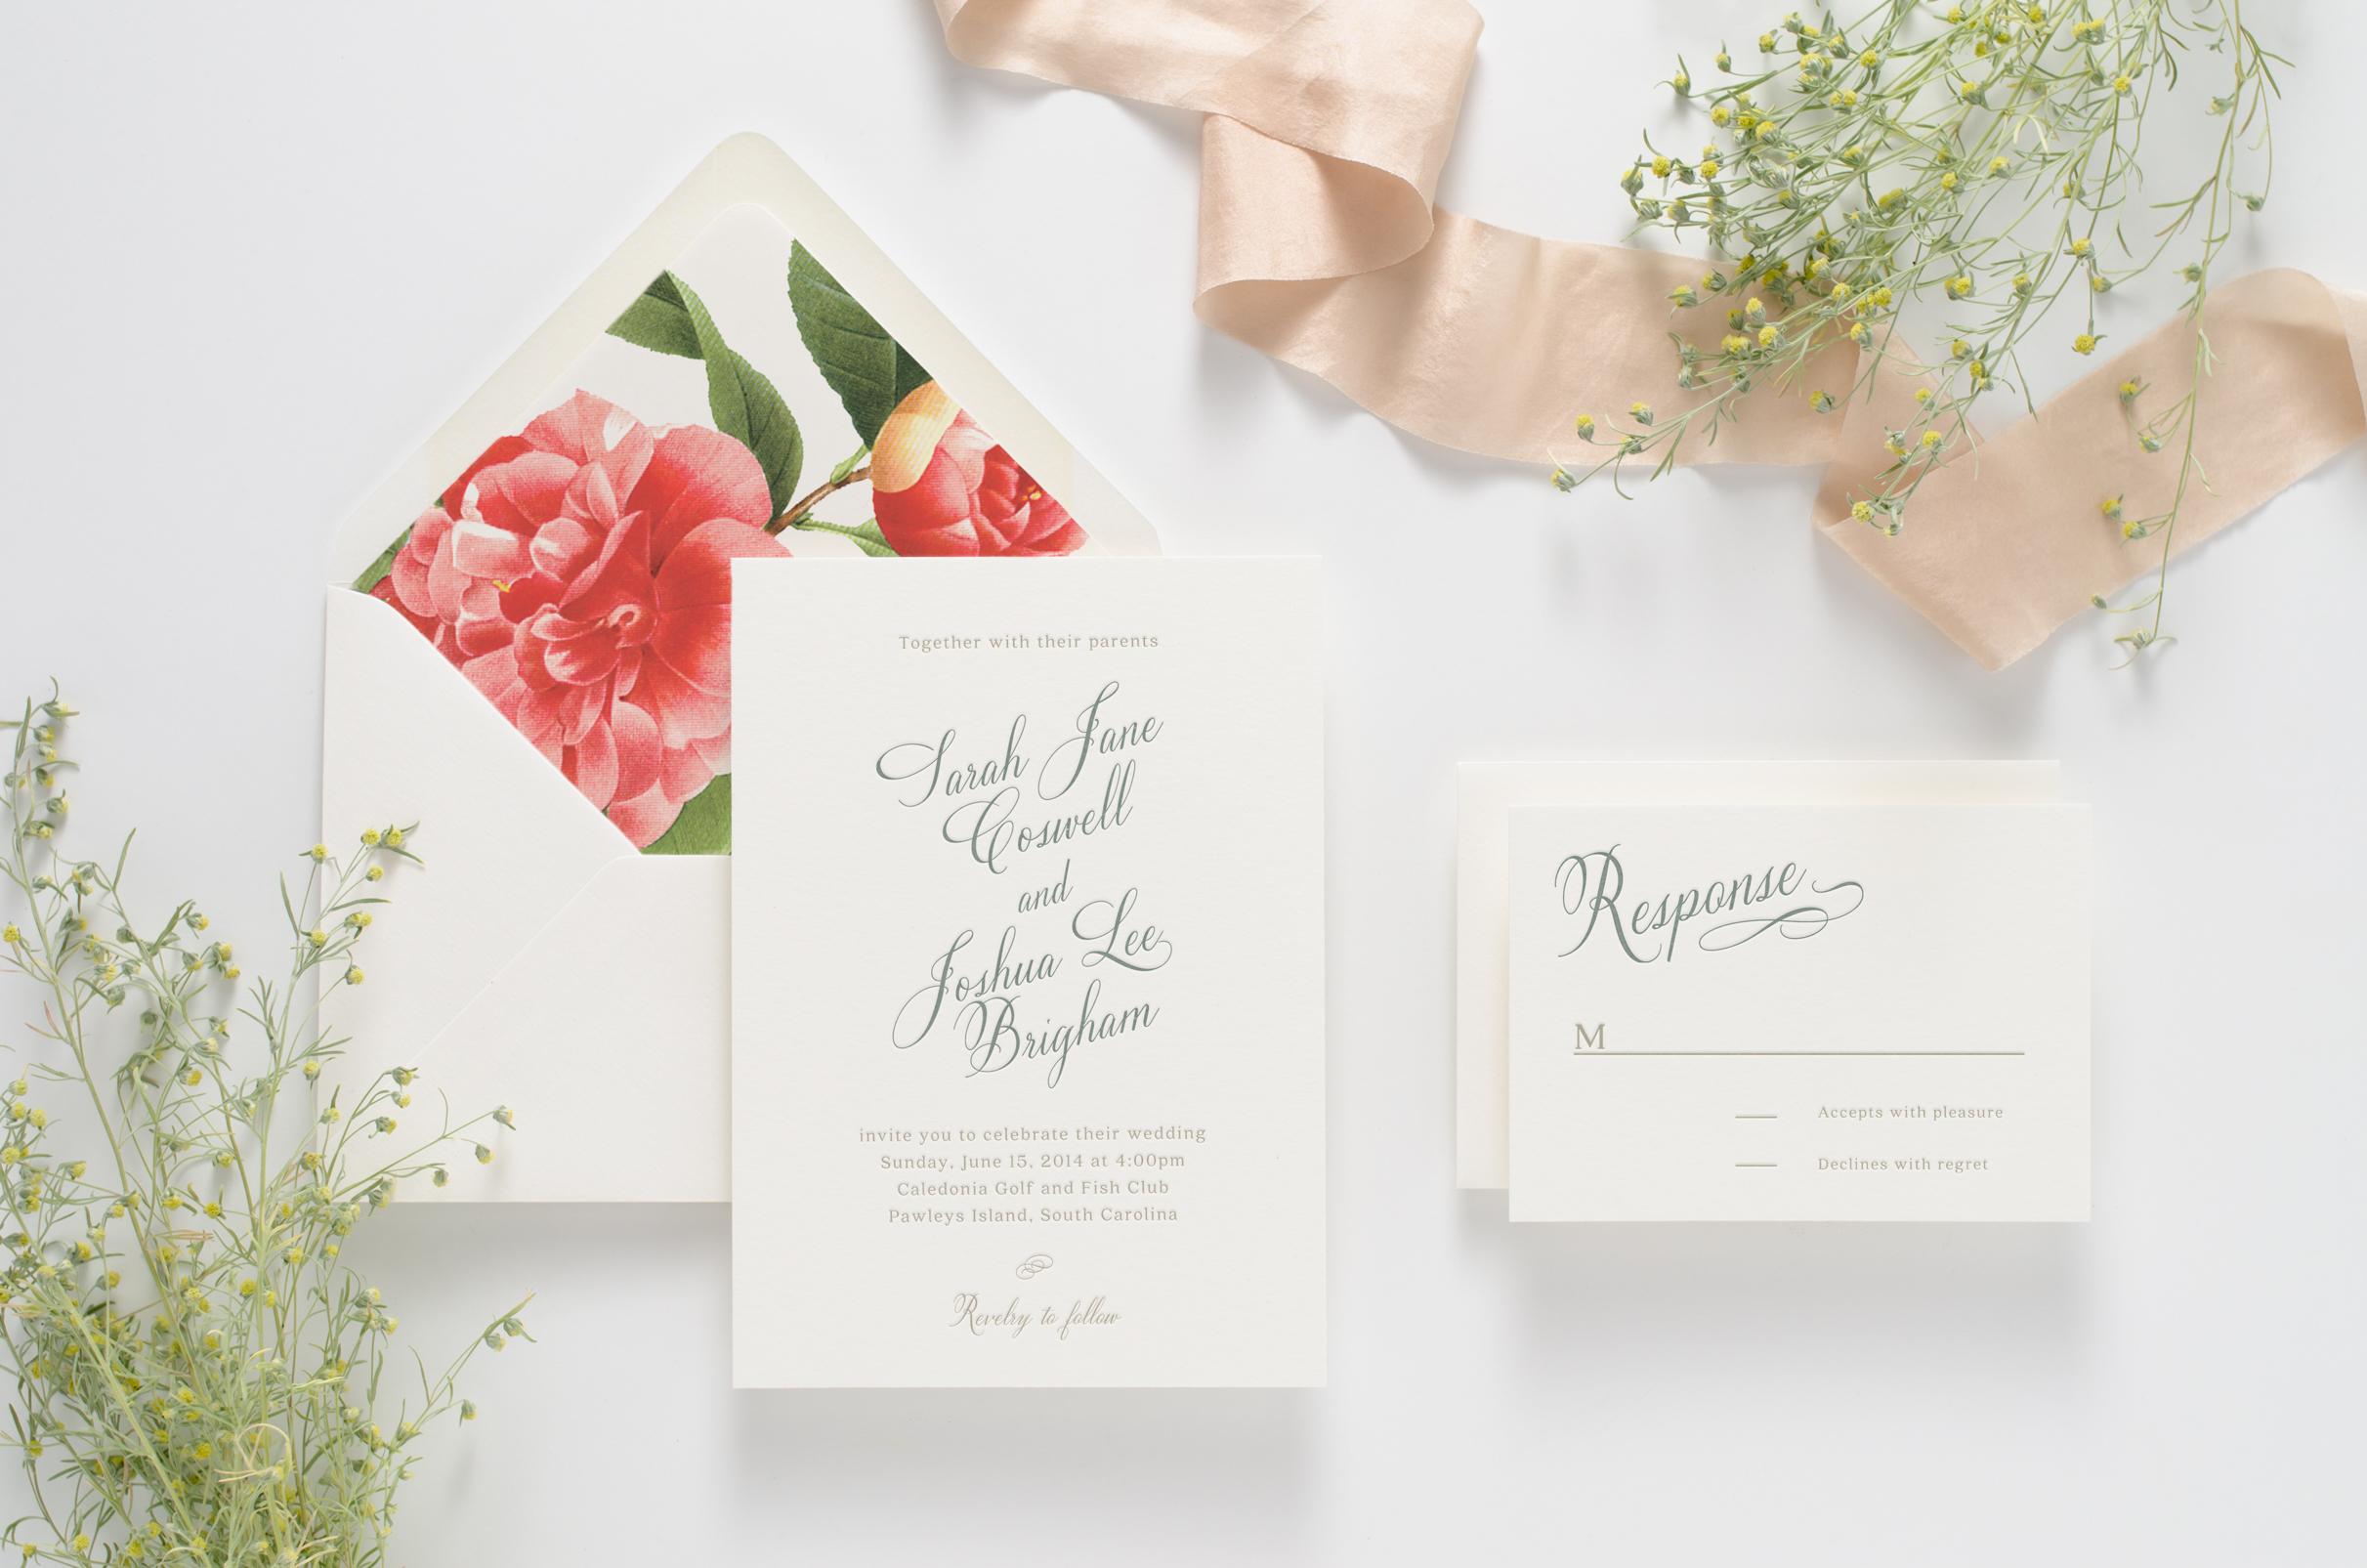 Calligraphy-based letterpress invitation suite with floral envelope liner